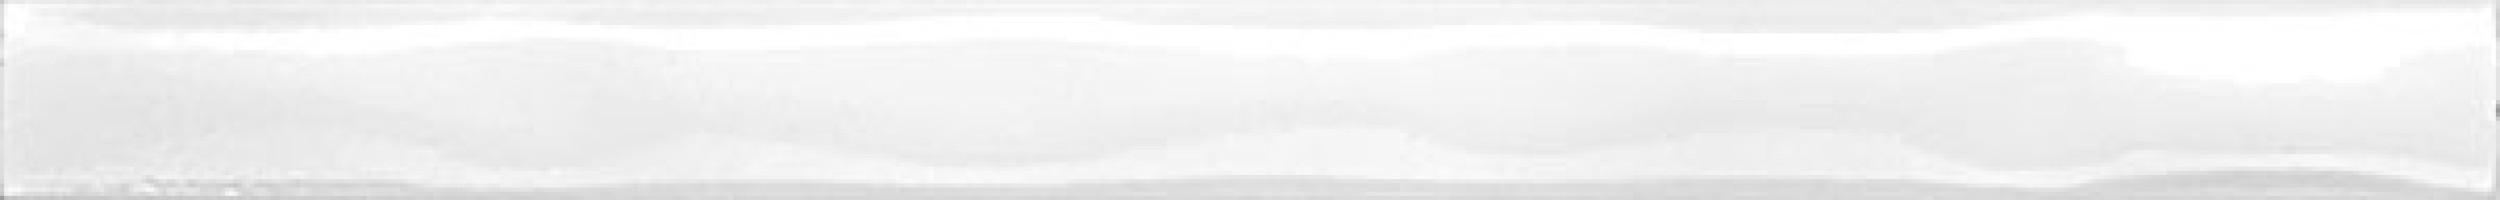 Бордюр 103 Карандаш волна белый 25х2 Kerama Marazzi